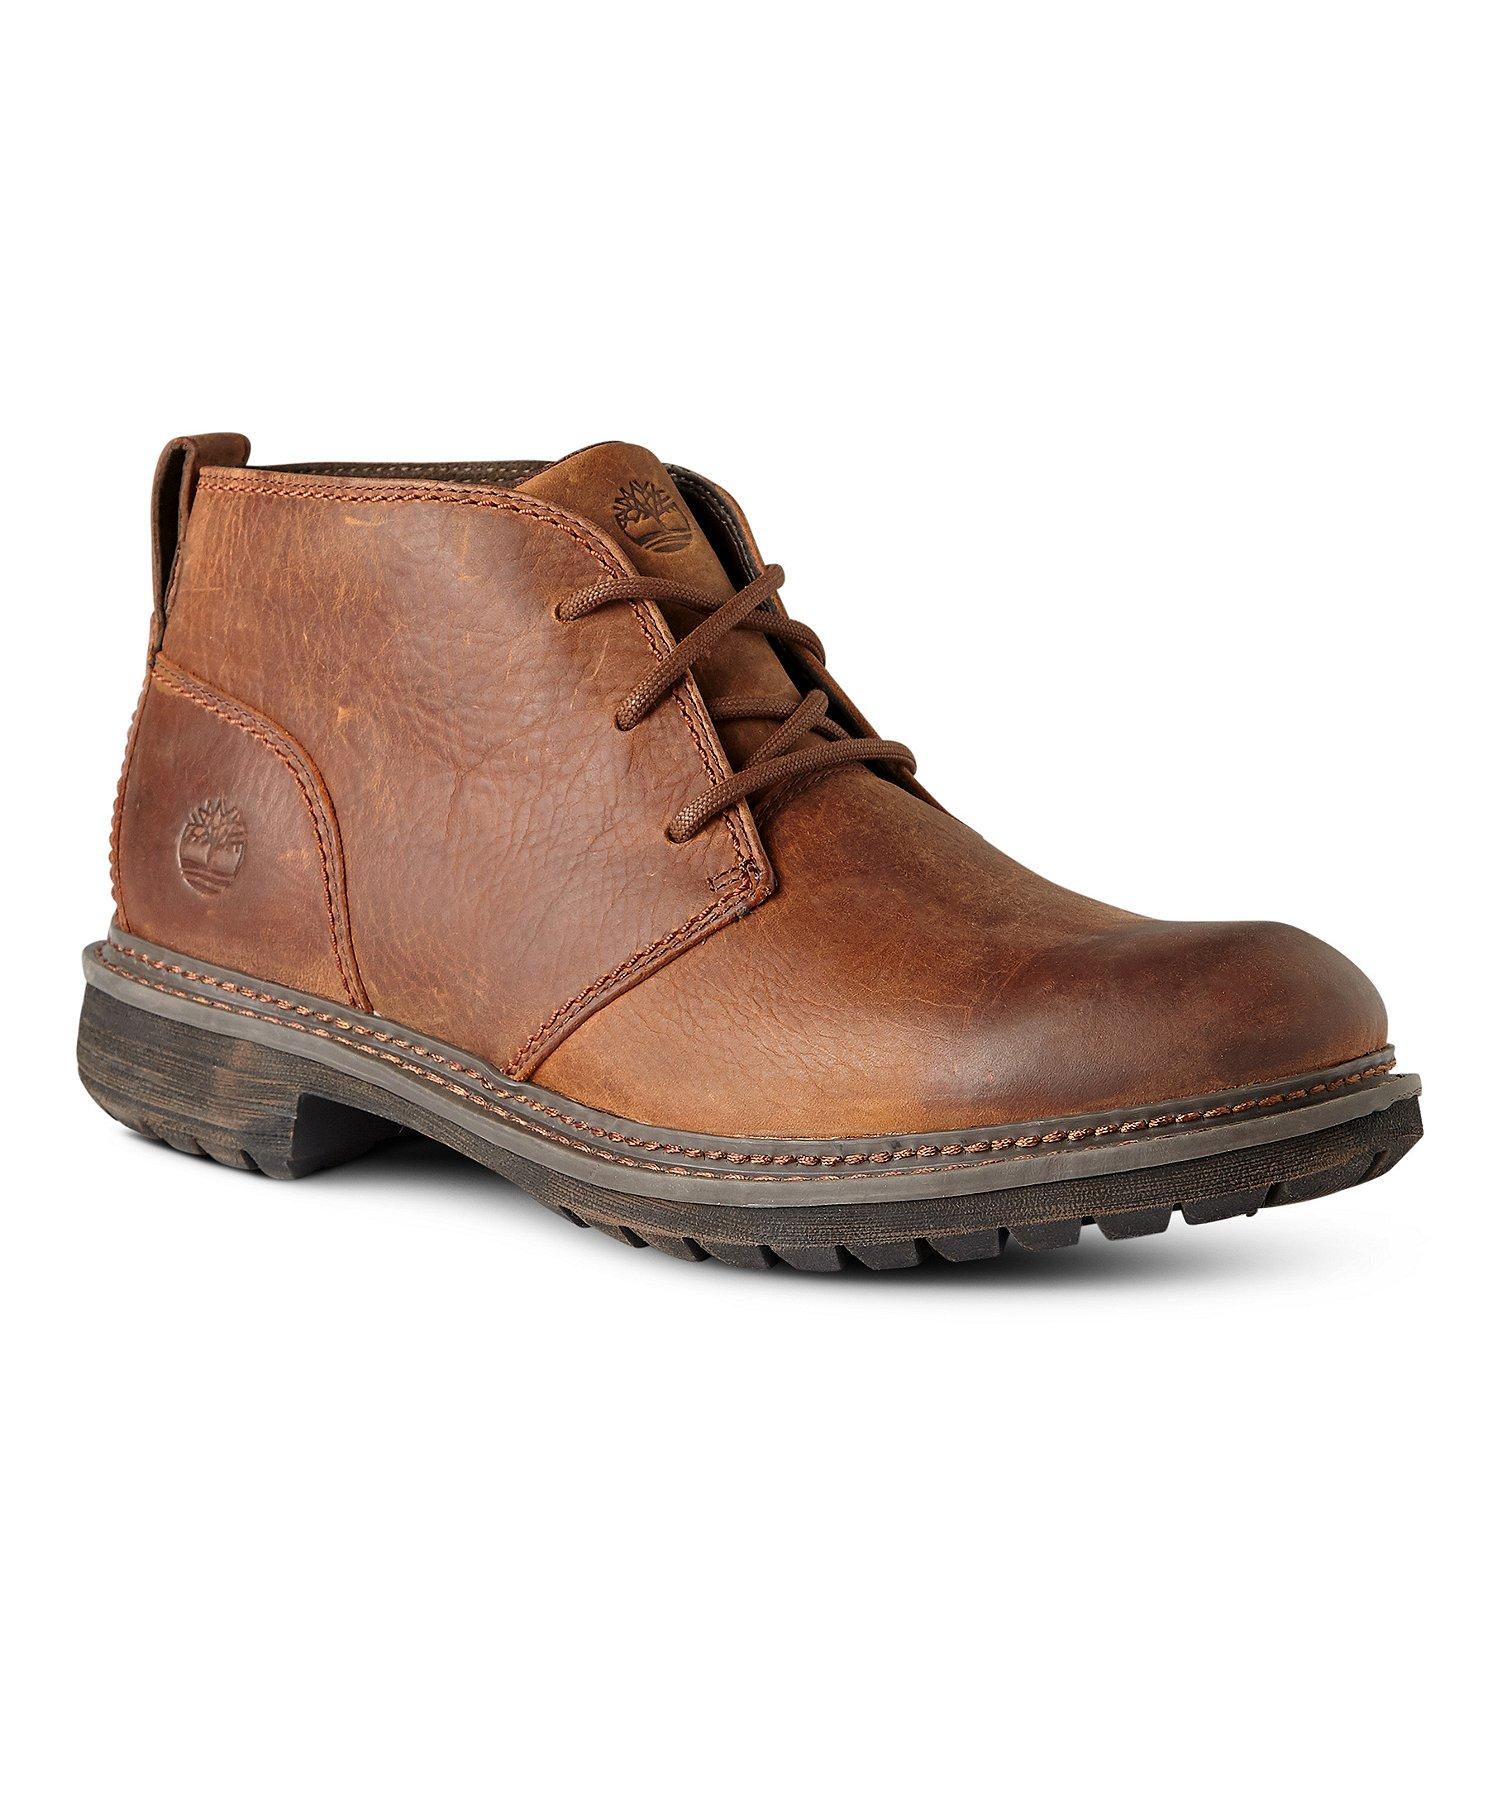 punto final par País  Men's Logan Bay Chukka Boots | Mark's